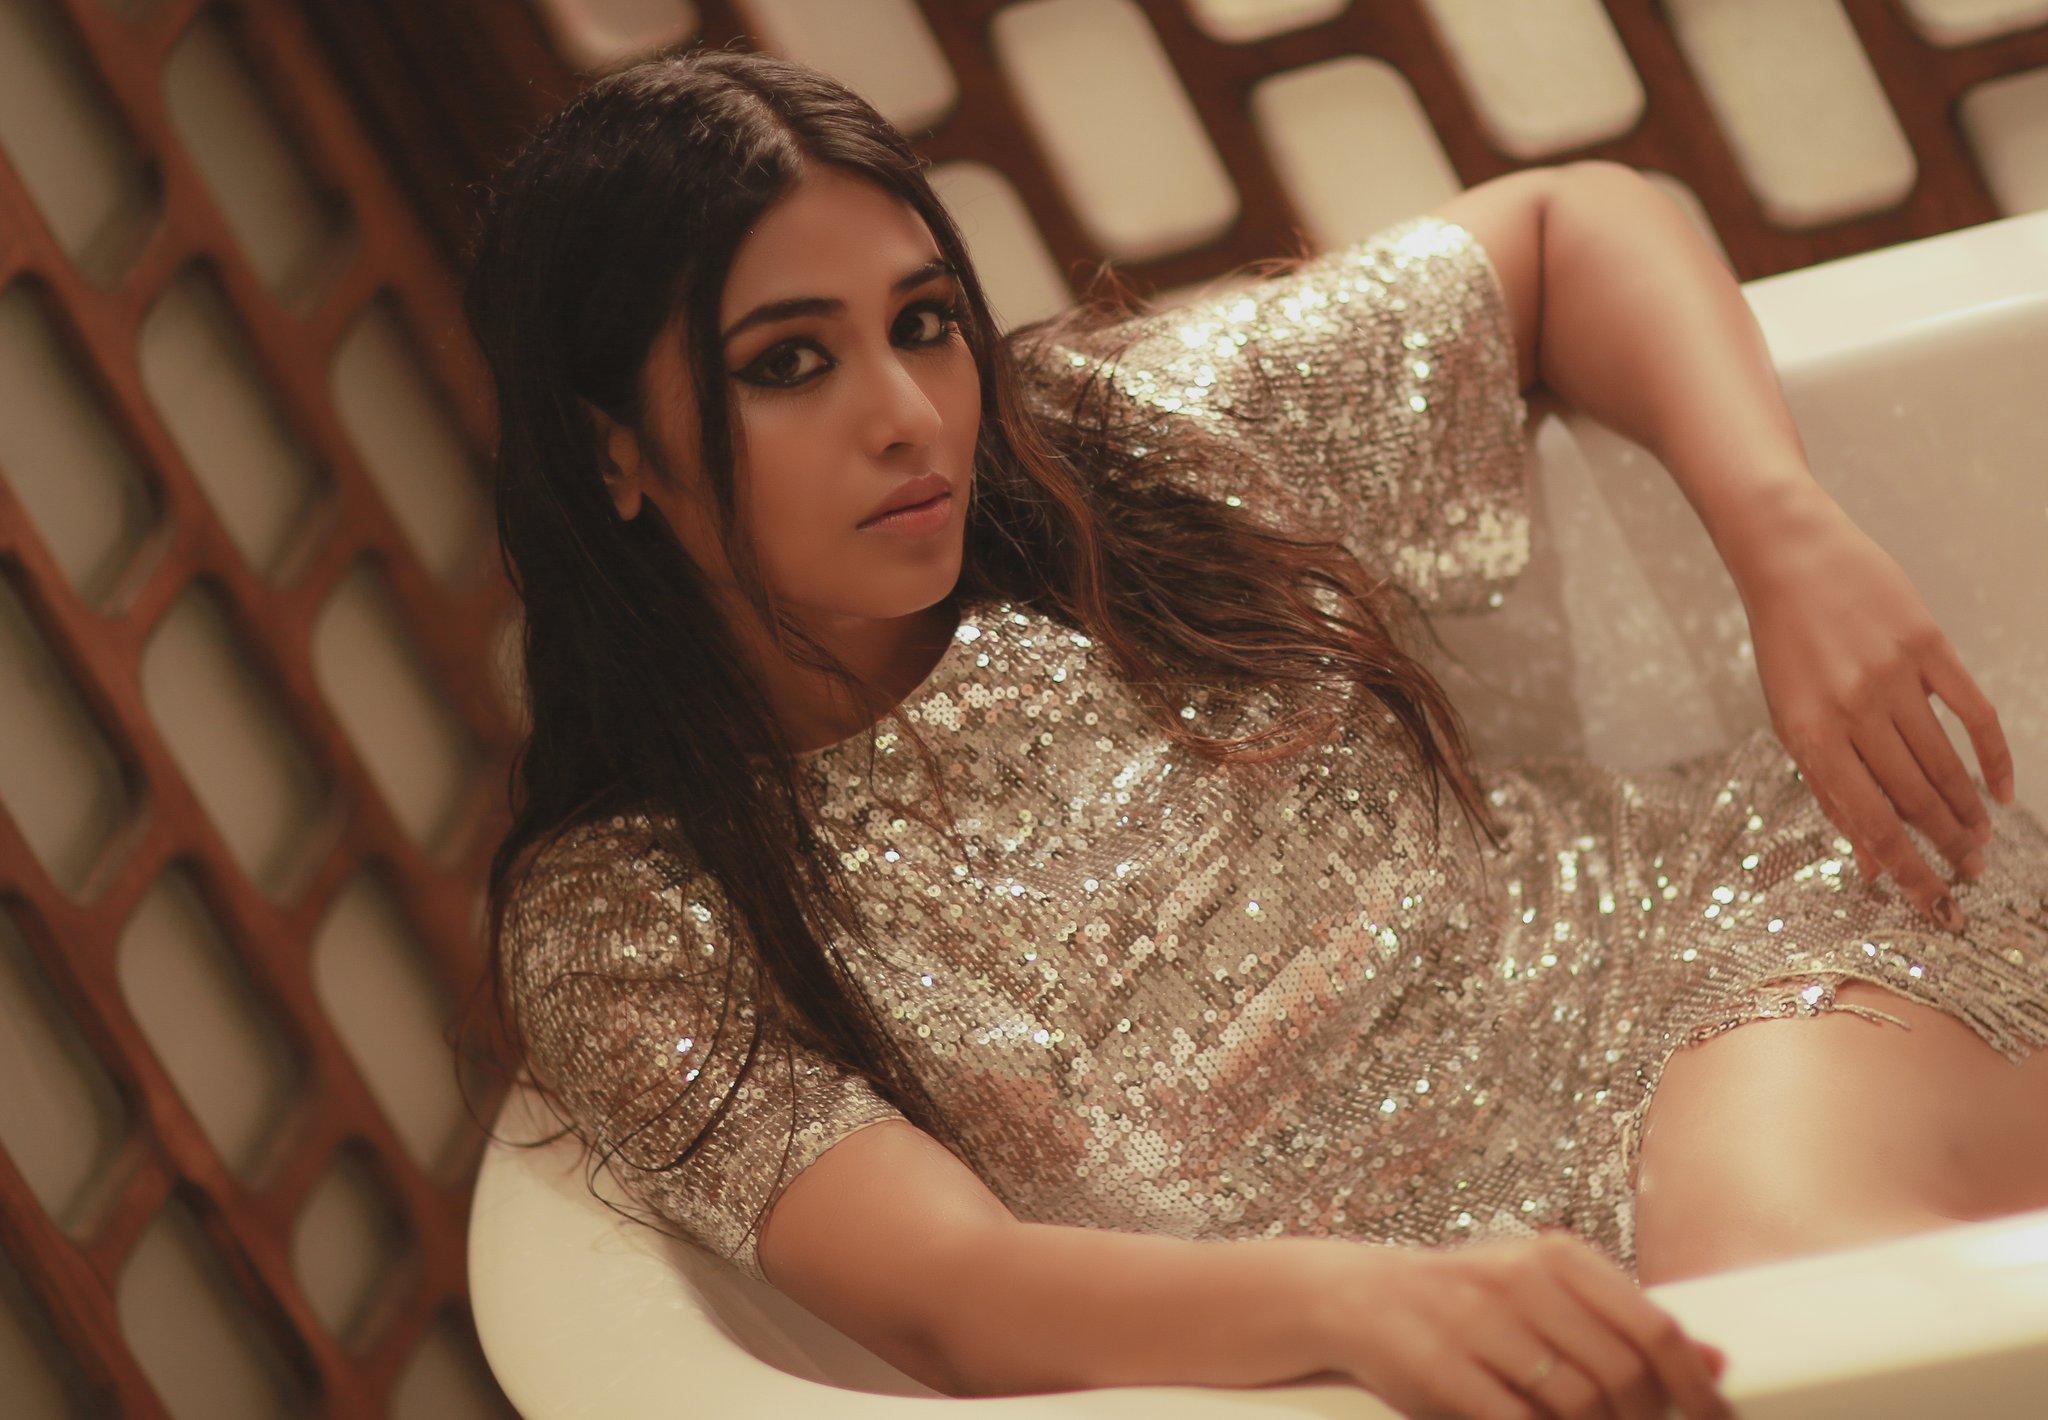 Indhuja Ravichandran New Stills, Indhuja Ravichandran 2021 photoshoot,Indhuja Ravichandran hot photoshoot, Indhuja Ravichandran in bathtub